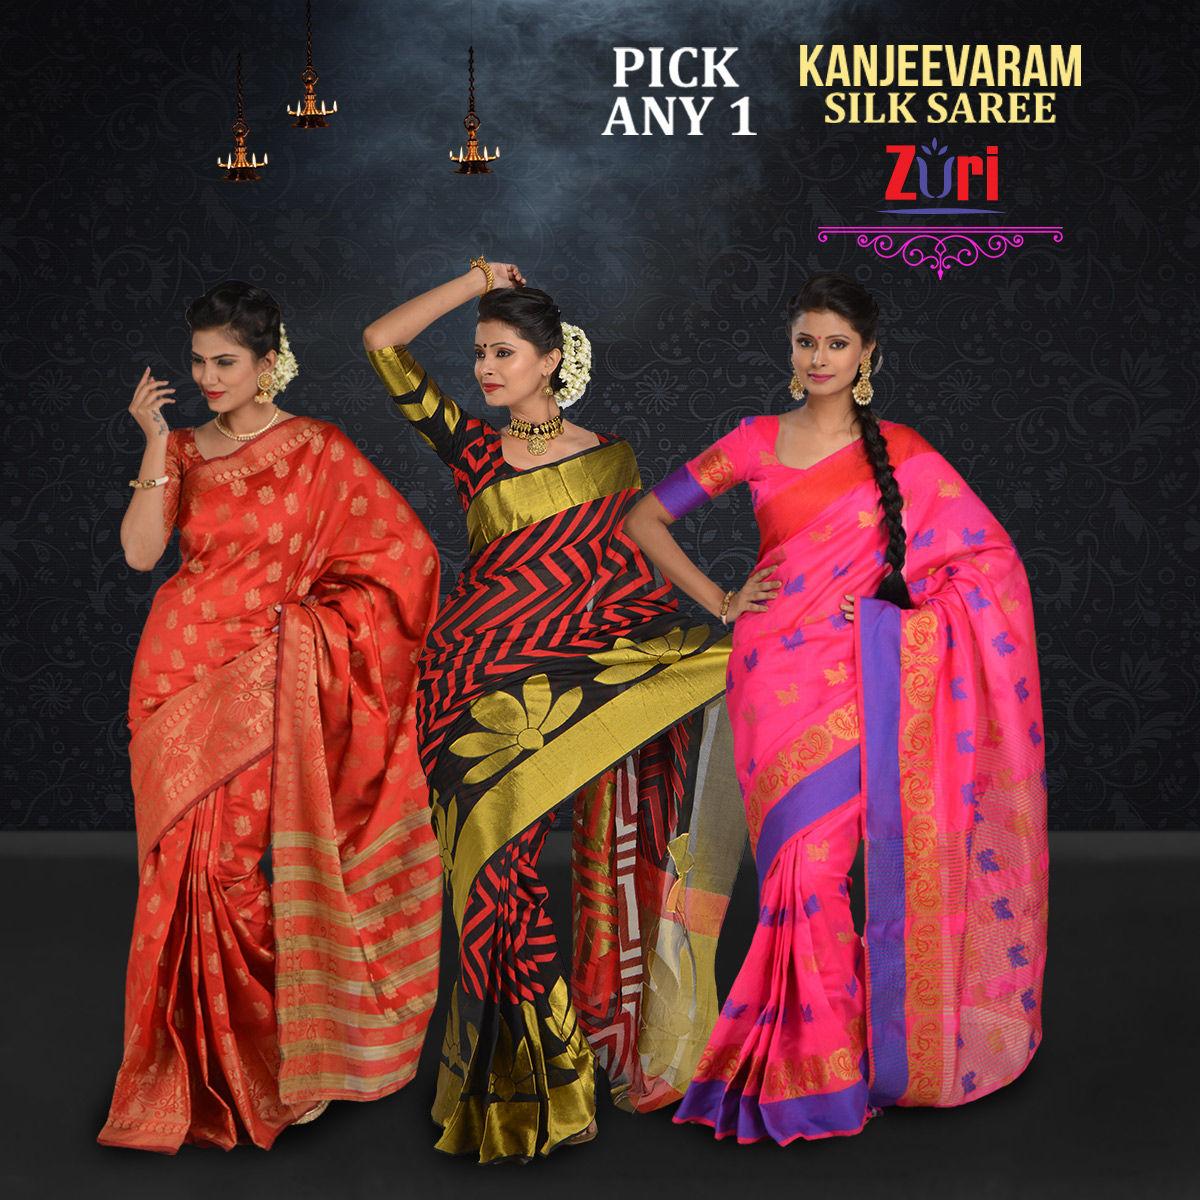 c72e78870f6 Buy Pick Any One Kanjeevaram Silk Saree (KSS4) Online at Best Price in India  on Naaptol.com